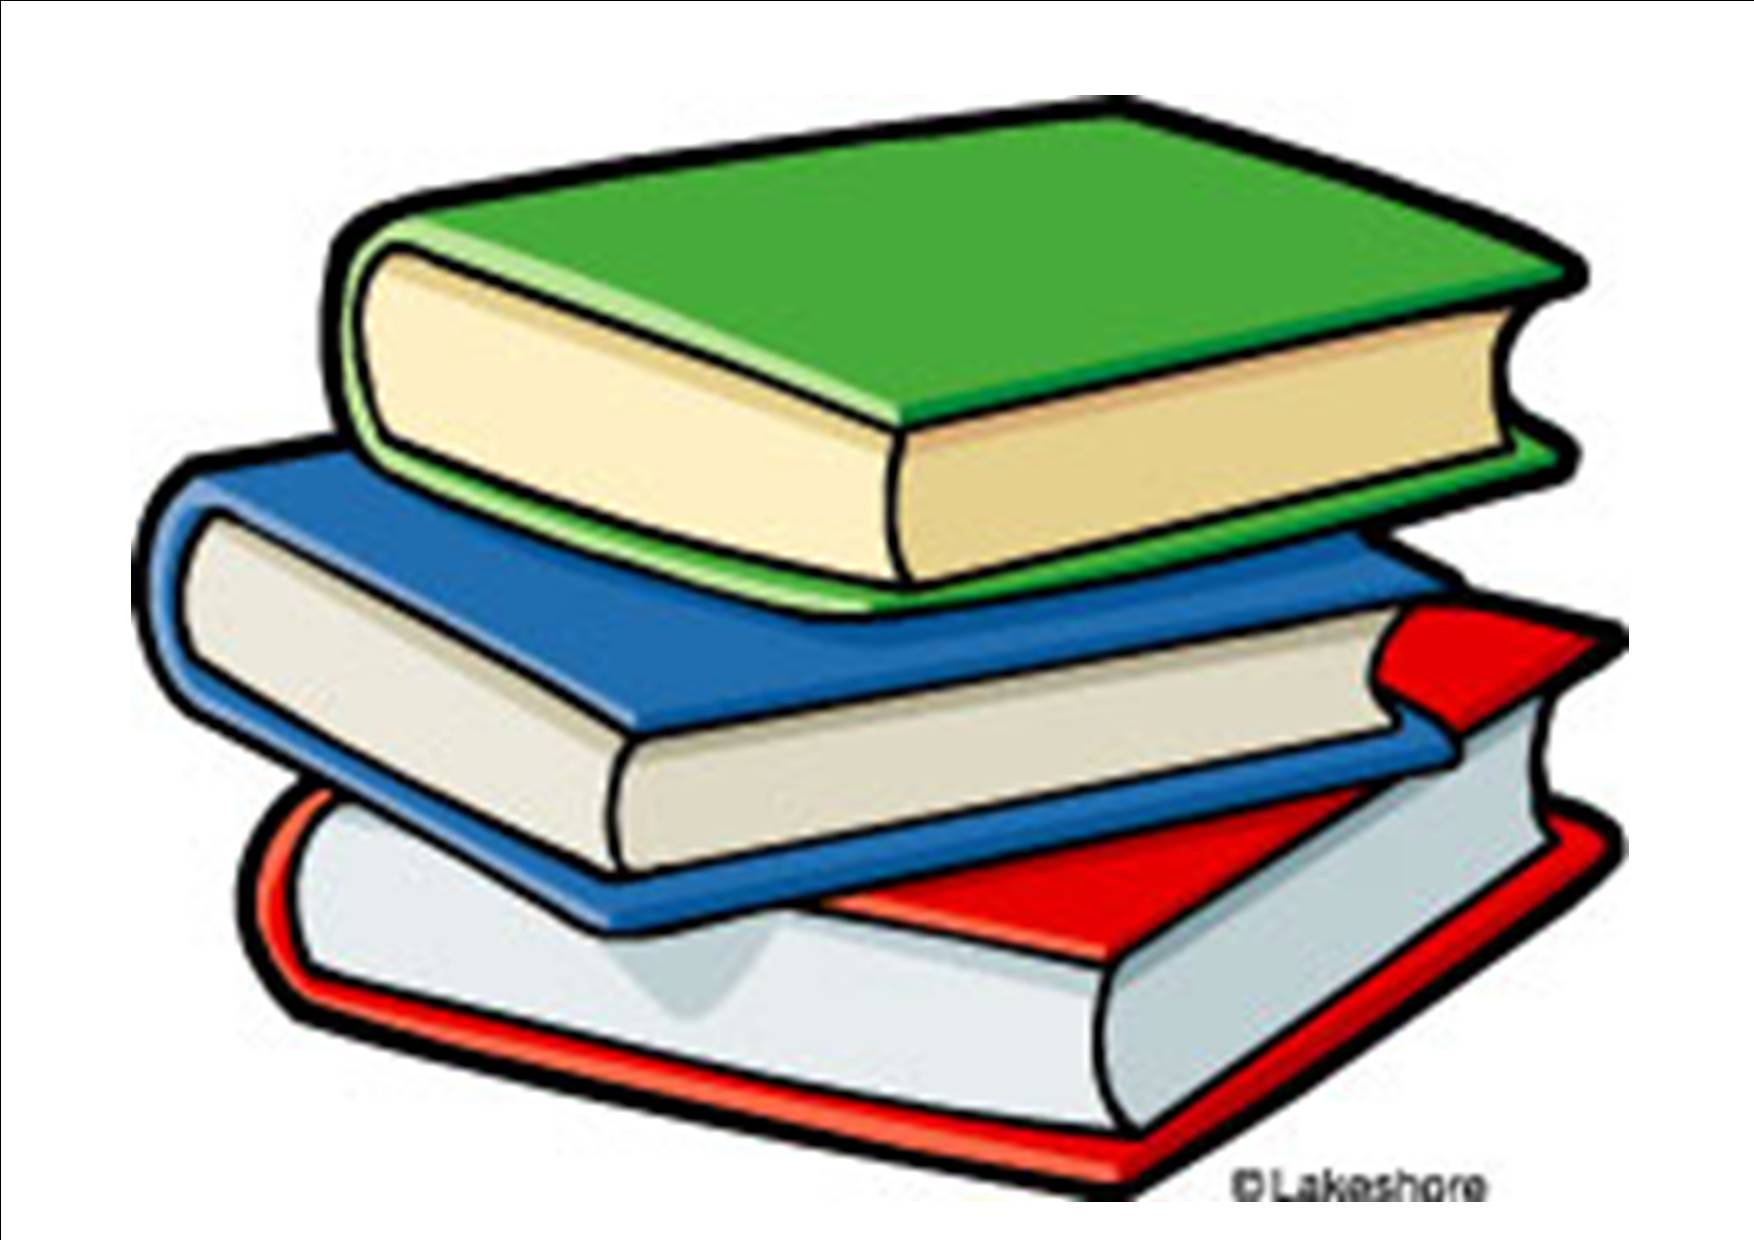 Book Clipart-book clipart-3